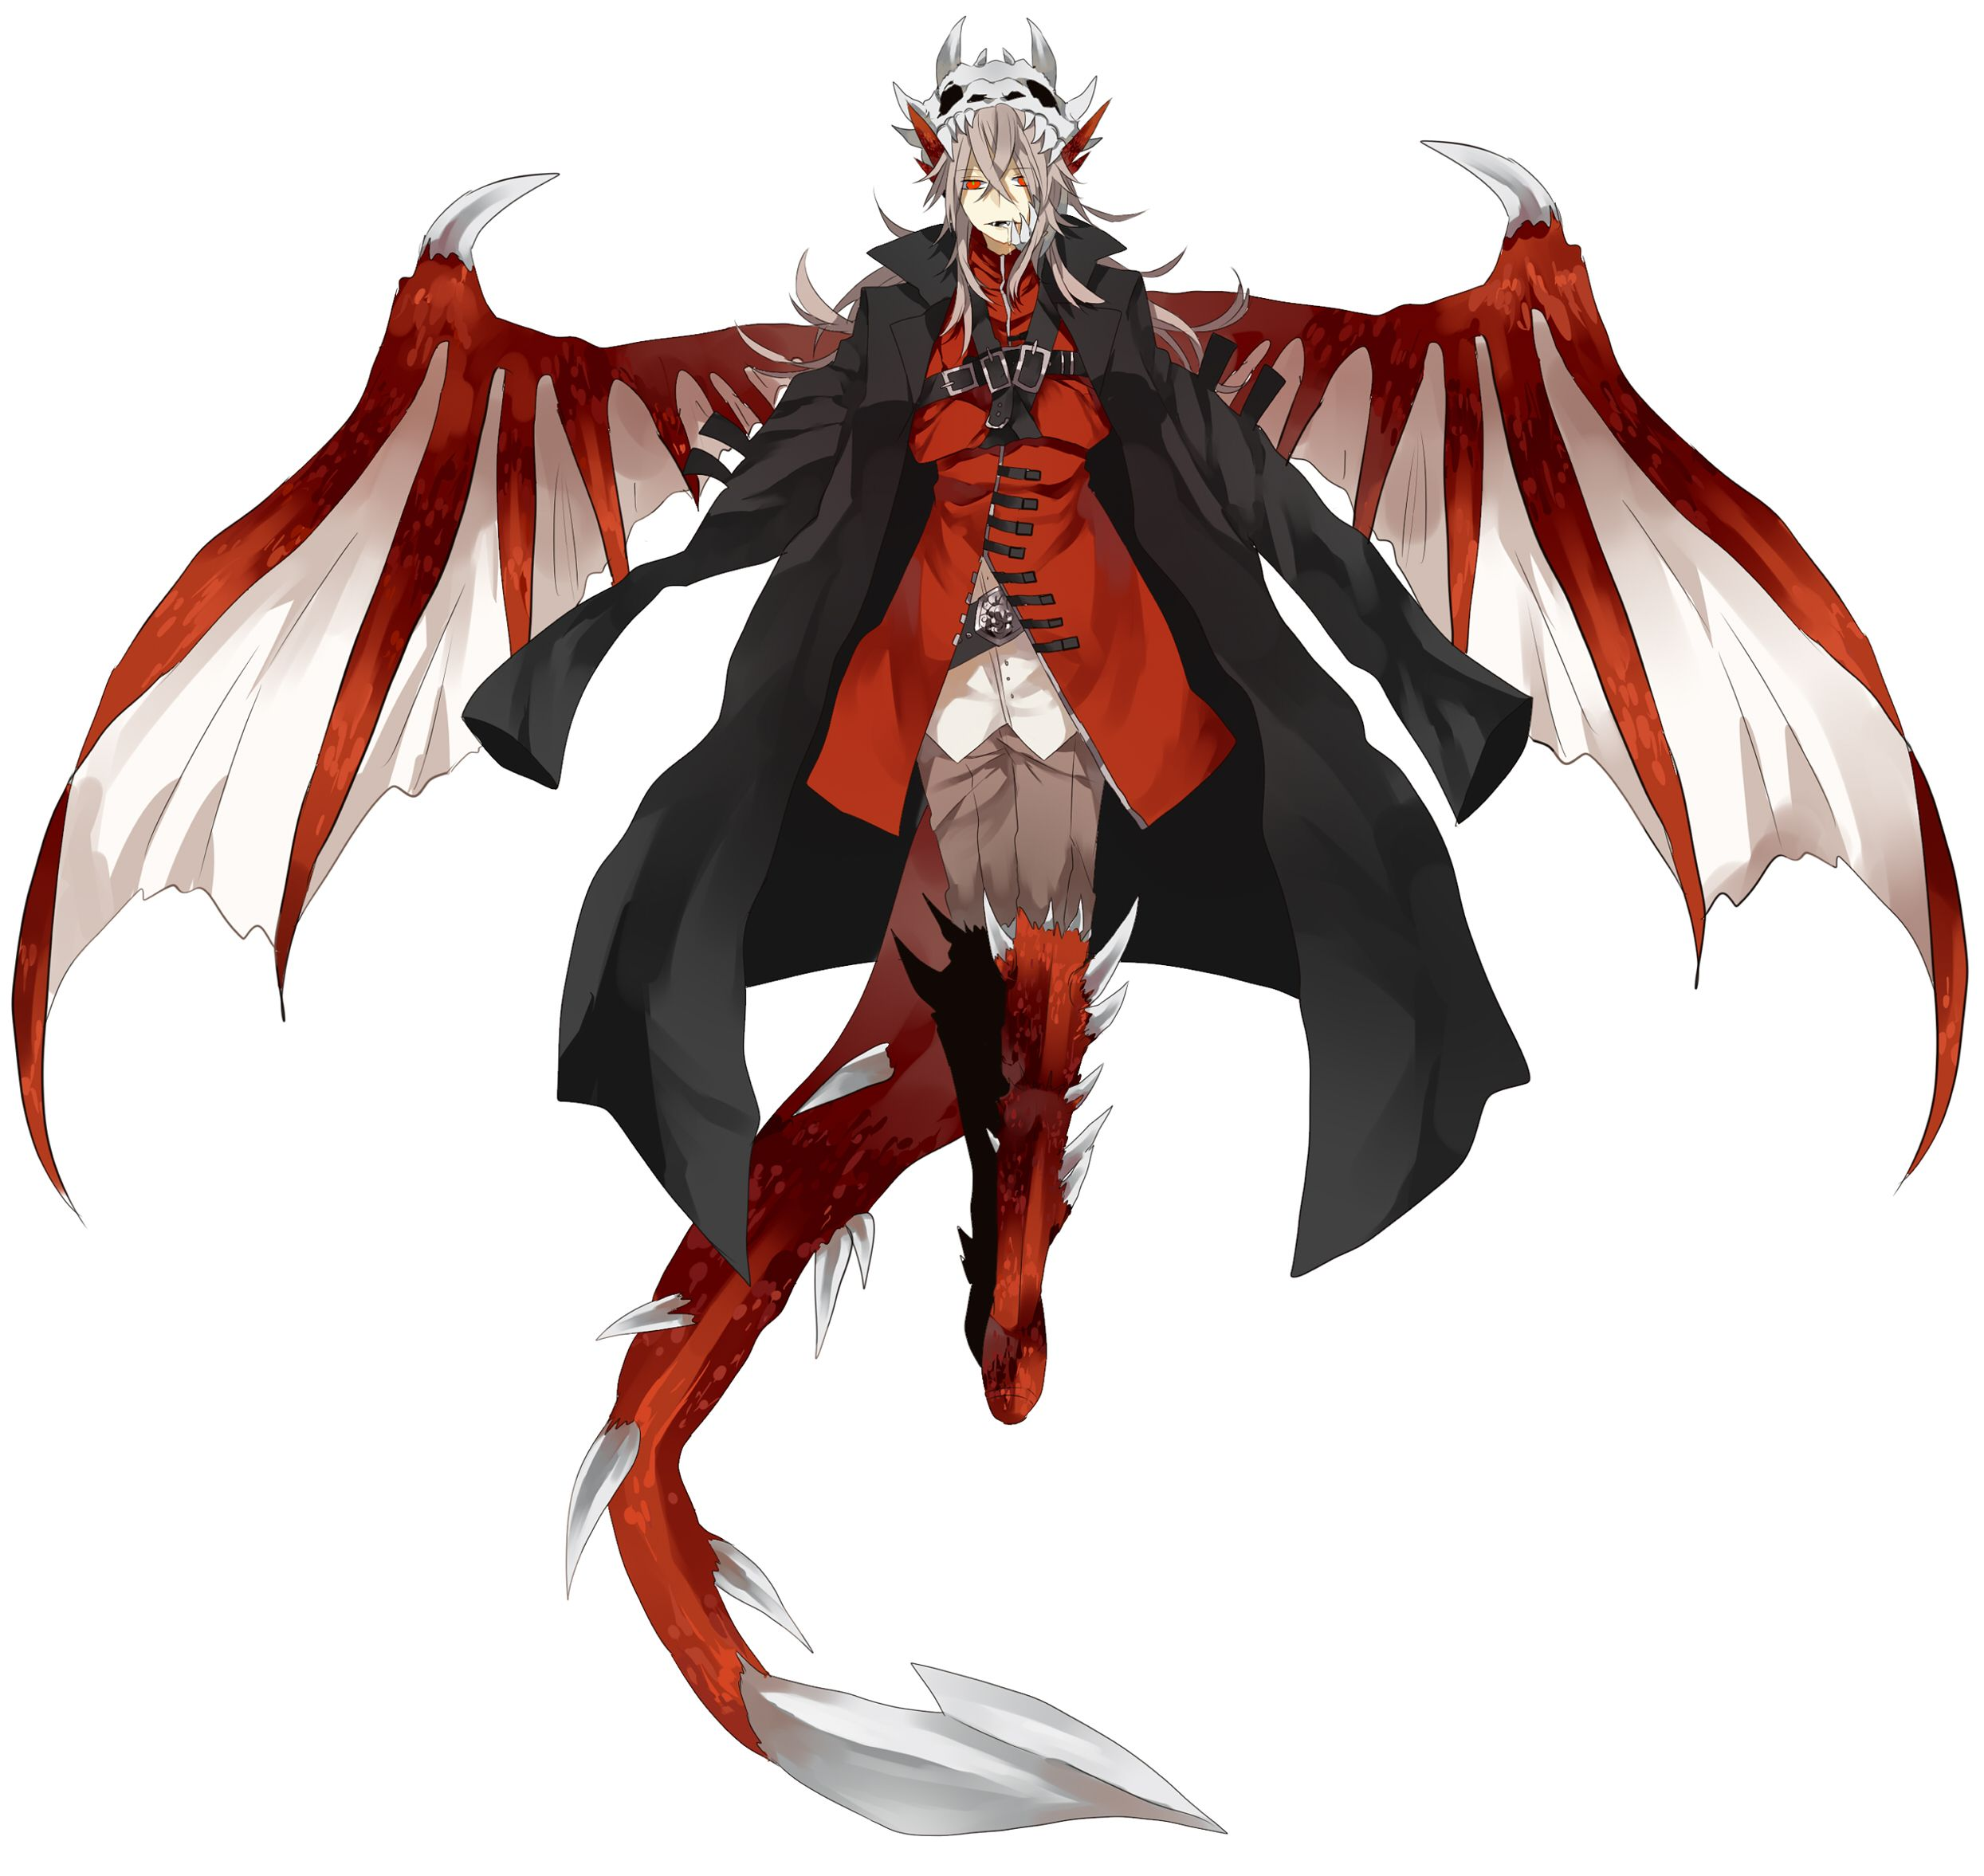 Http Static Zerochan Net Shilla P Full 389624 Jpg Anime Demon Boy Concept Art Characters Fantasy Character Design